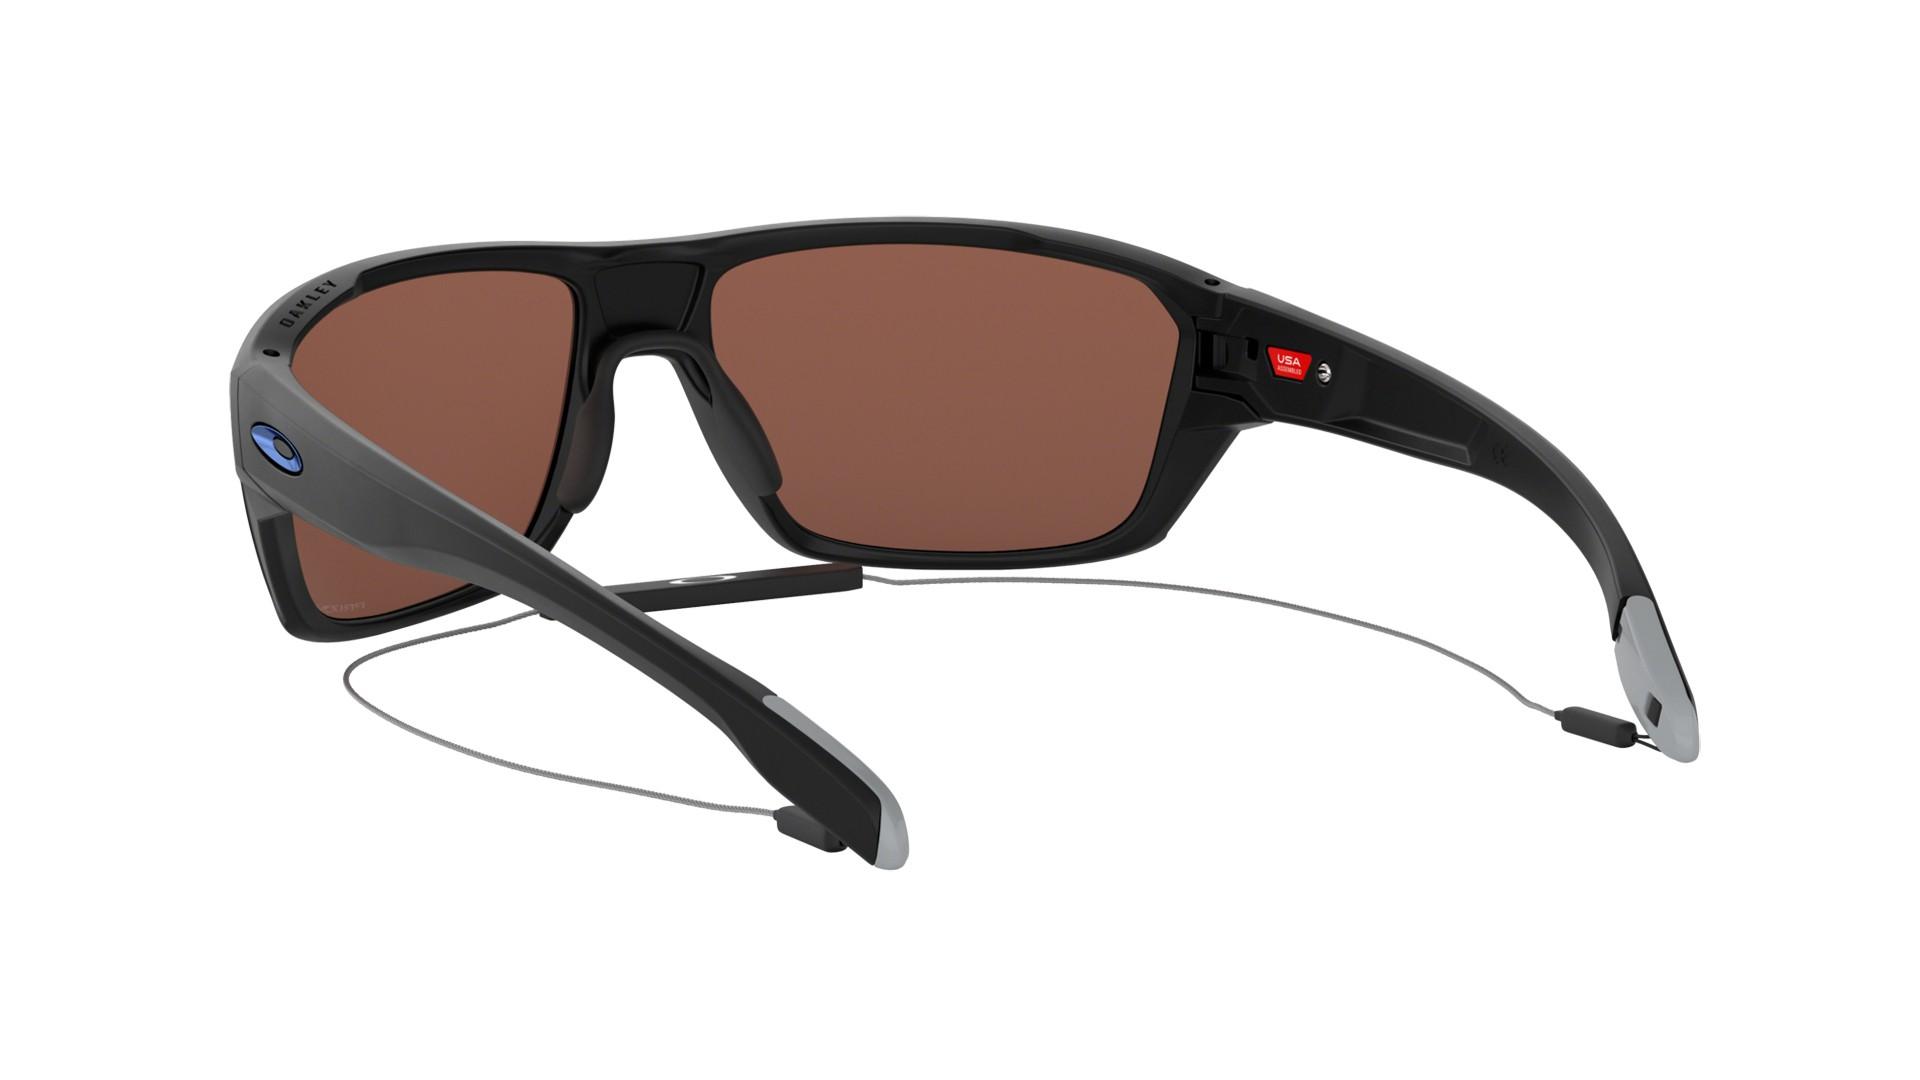 7ab5ba8964 Sunglasses Oakley Split Shot Black Prizm deep water OO9416 06 64-17 Large  Polarized Flash